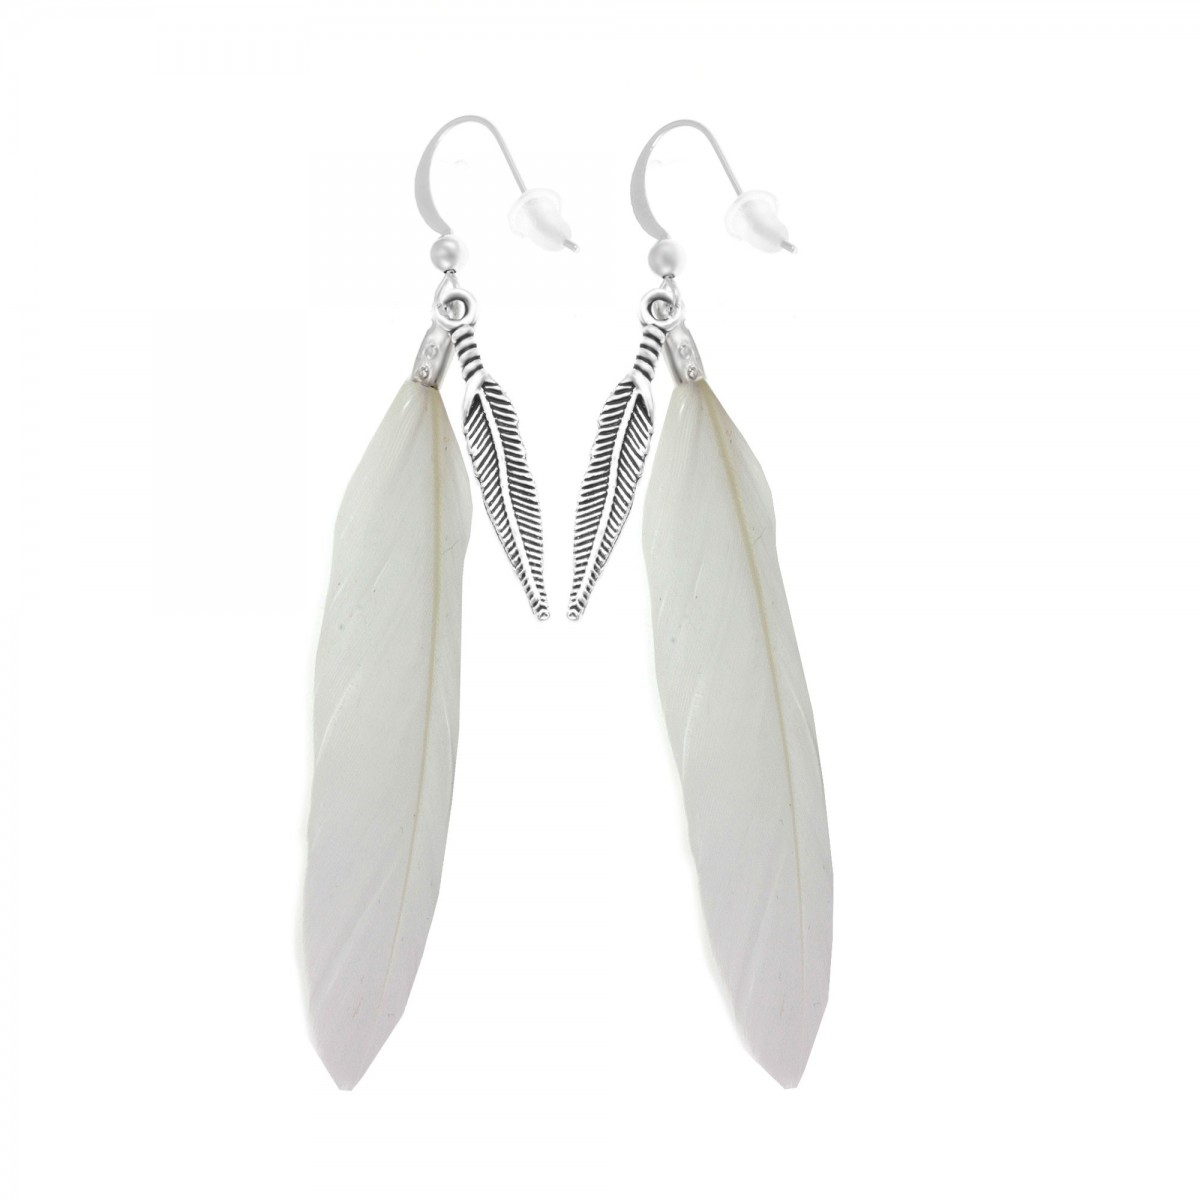 Boucles d'oreilles plumes blanches So Charm